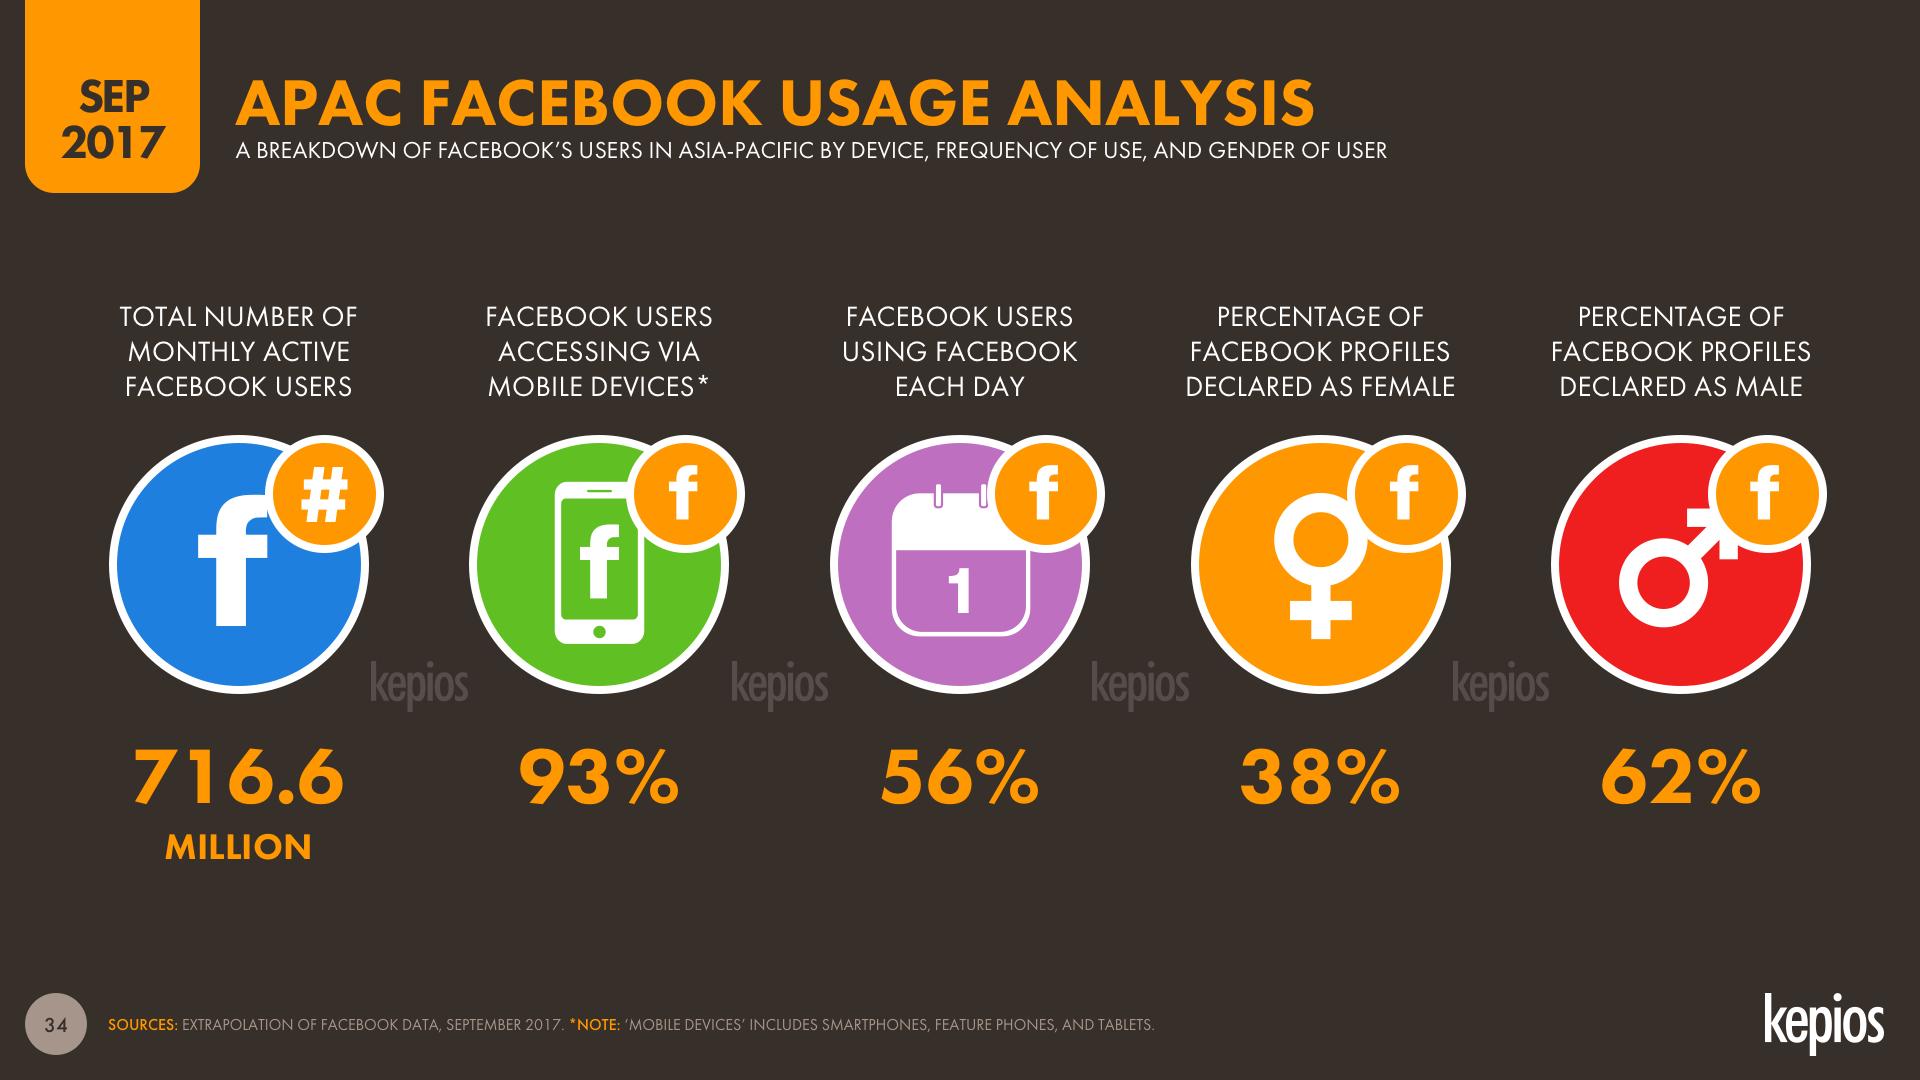 APAC Facebook User Insights, Sep 2017